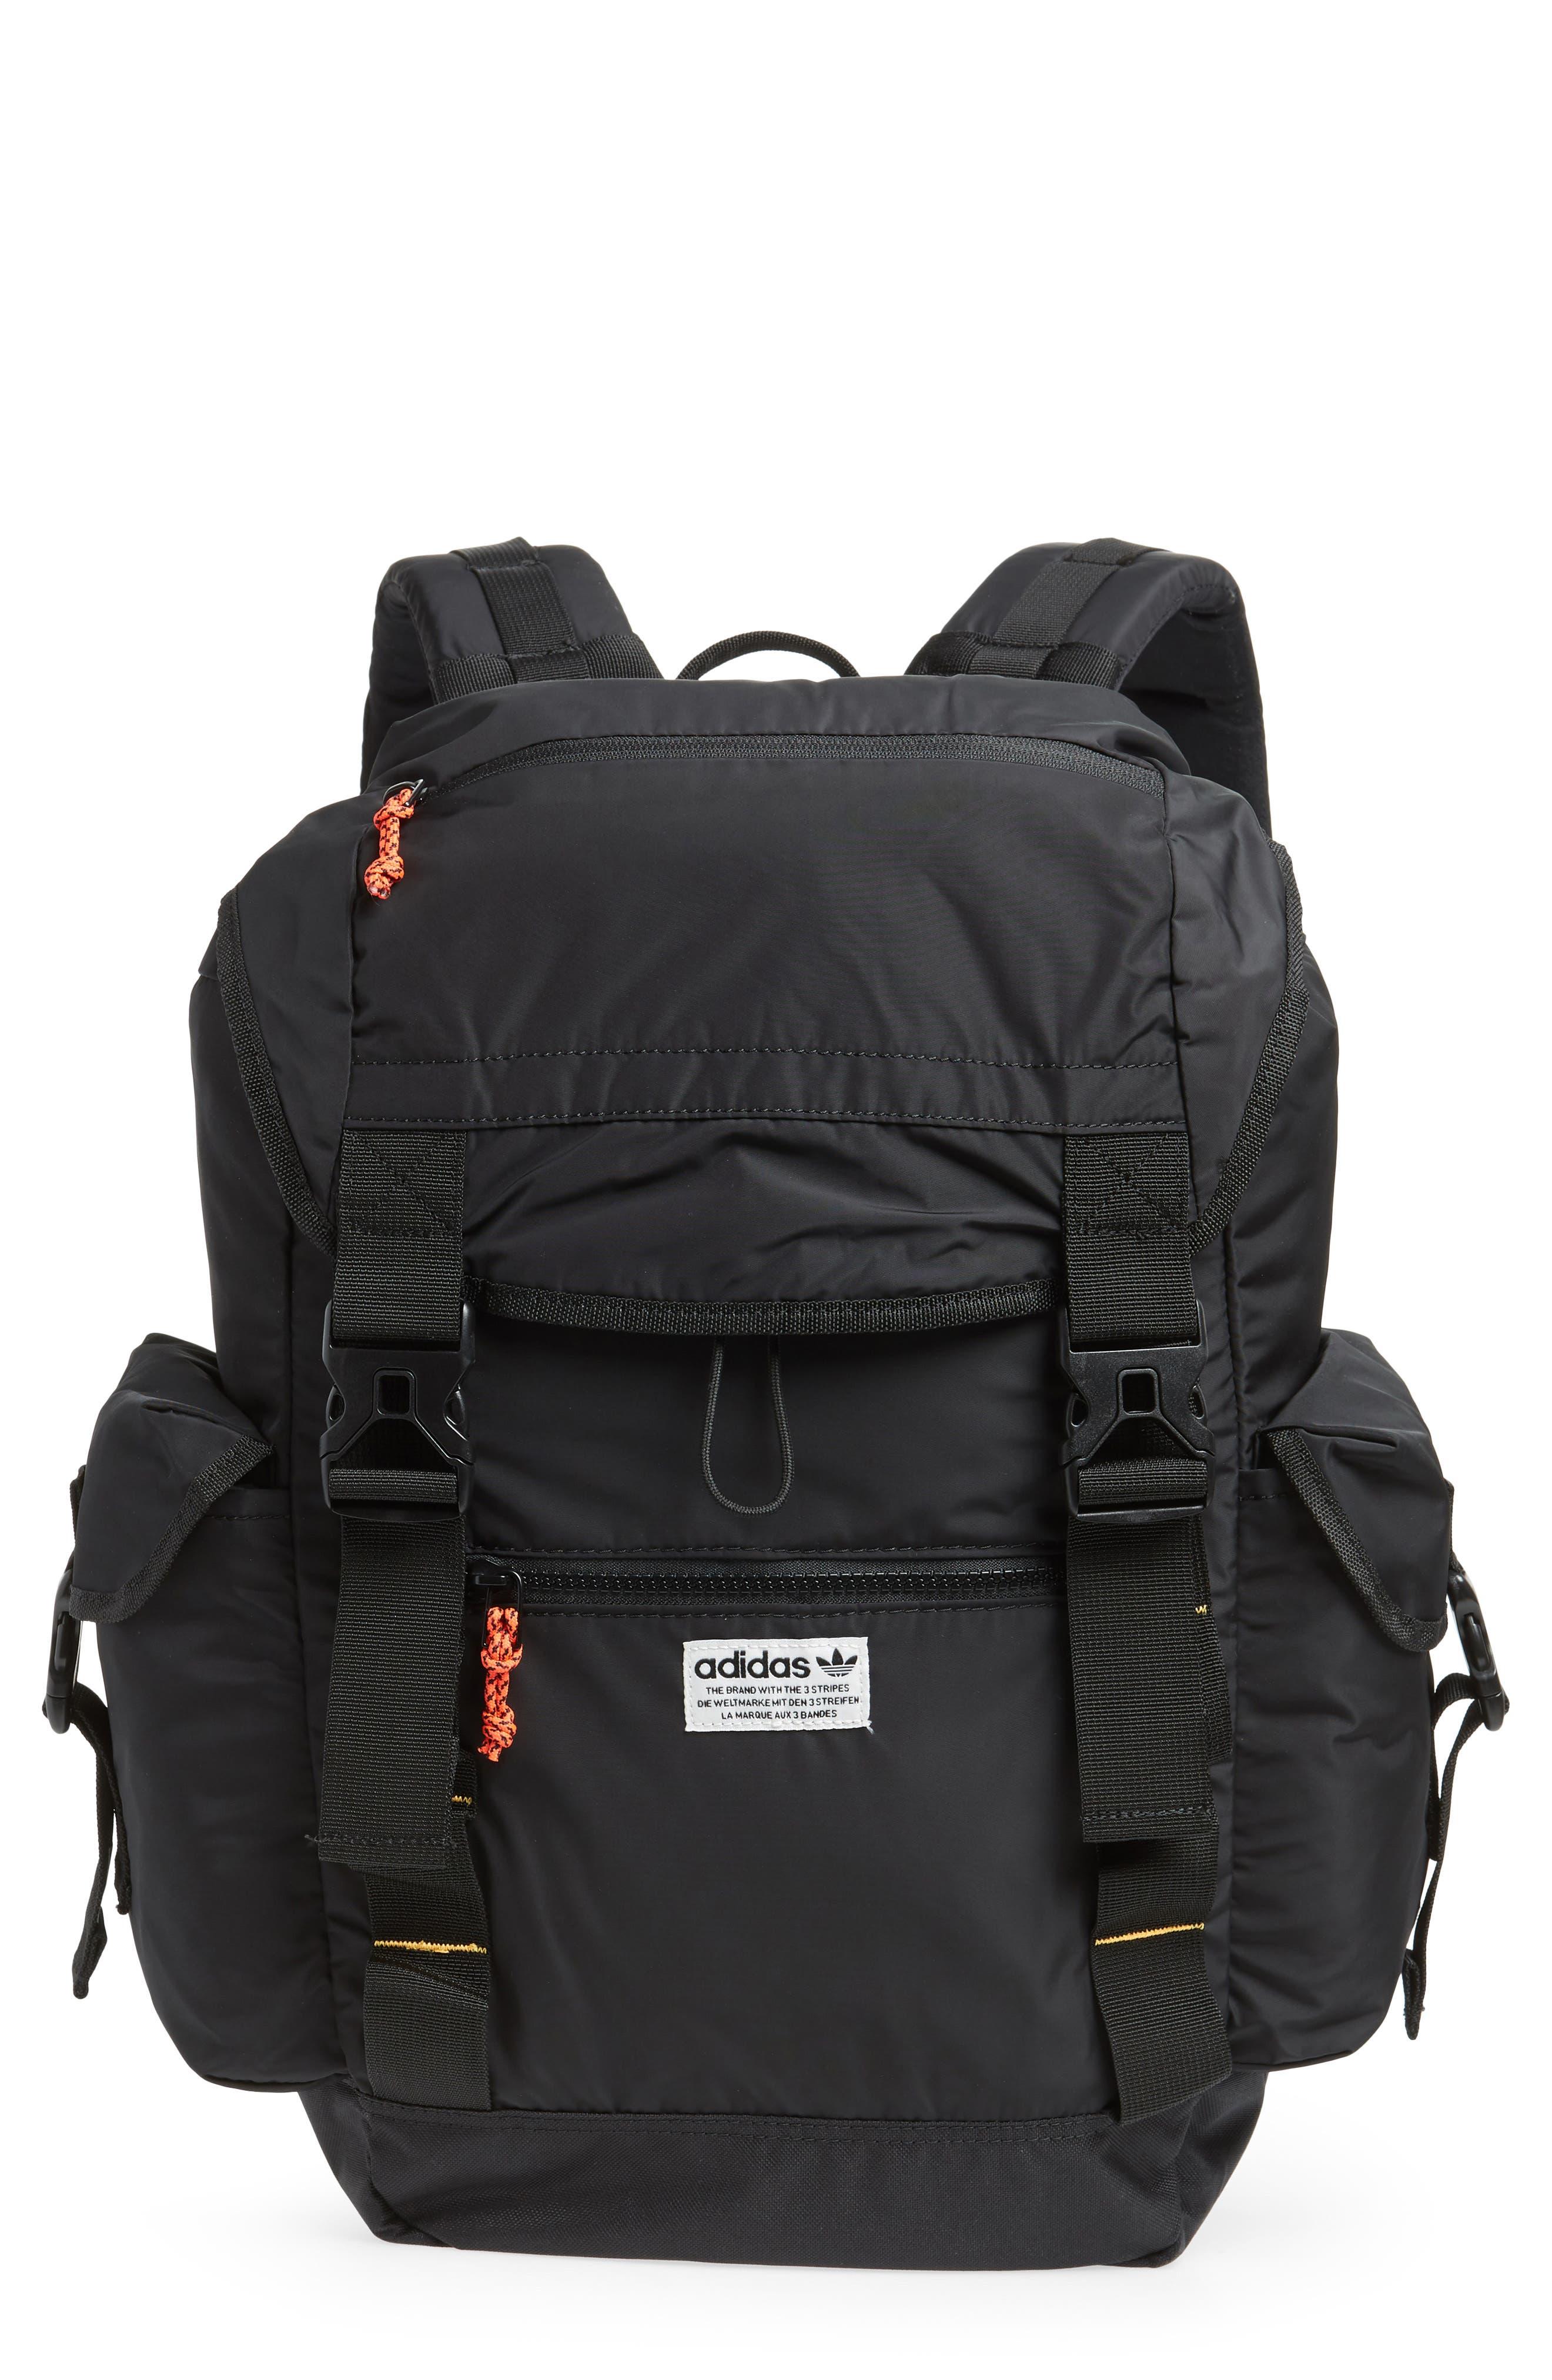 Urban Utility Backpack,                             Main thumbnail 1, color,                             001